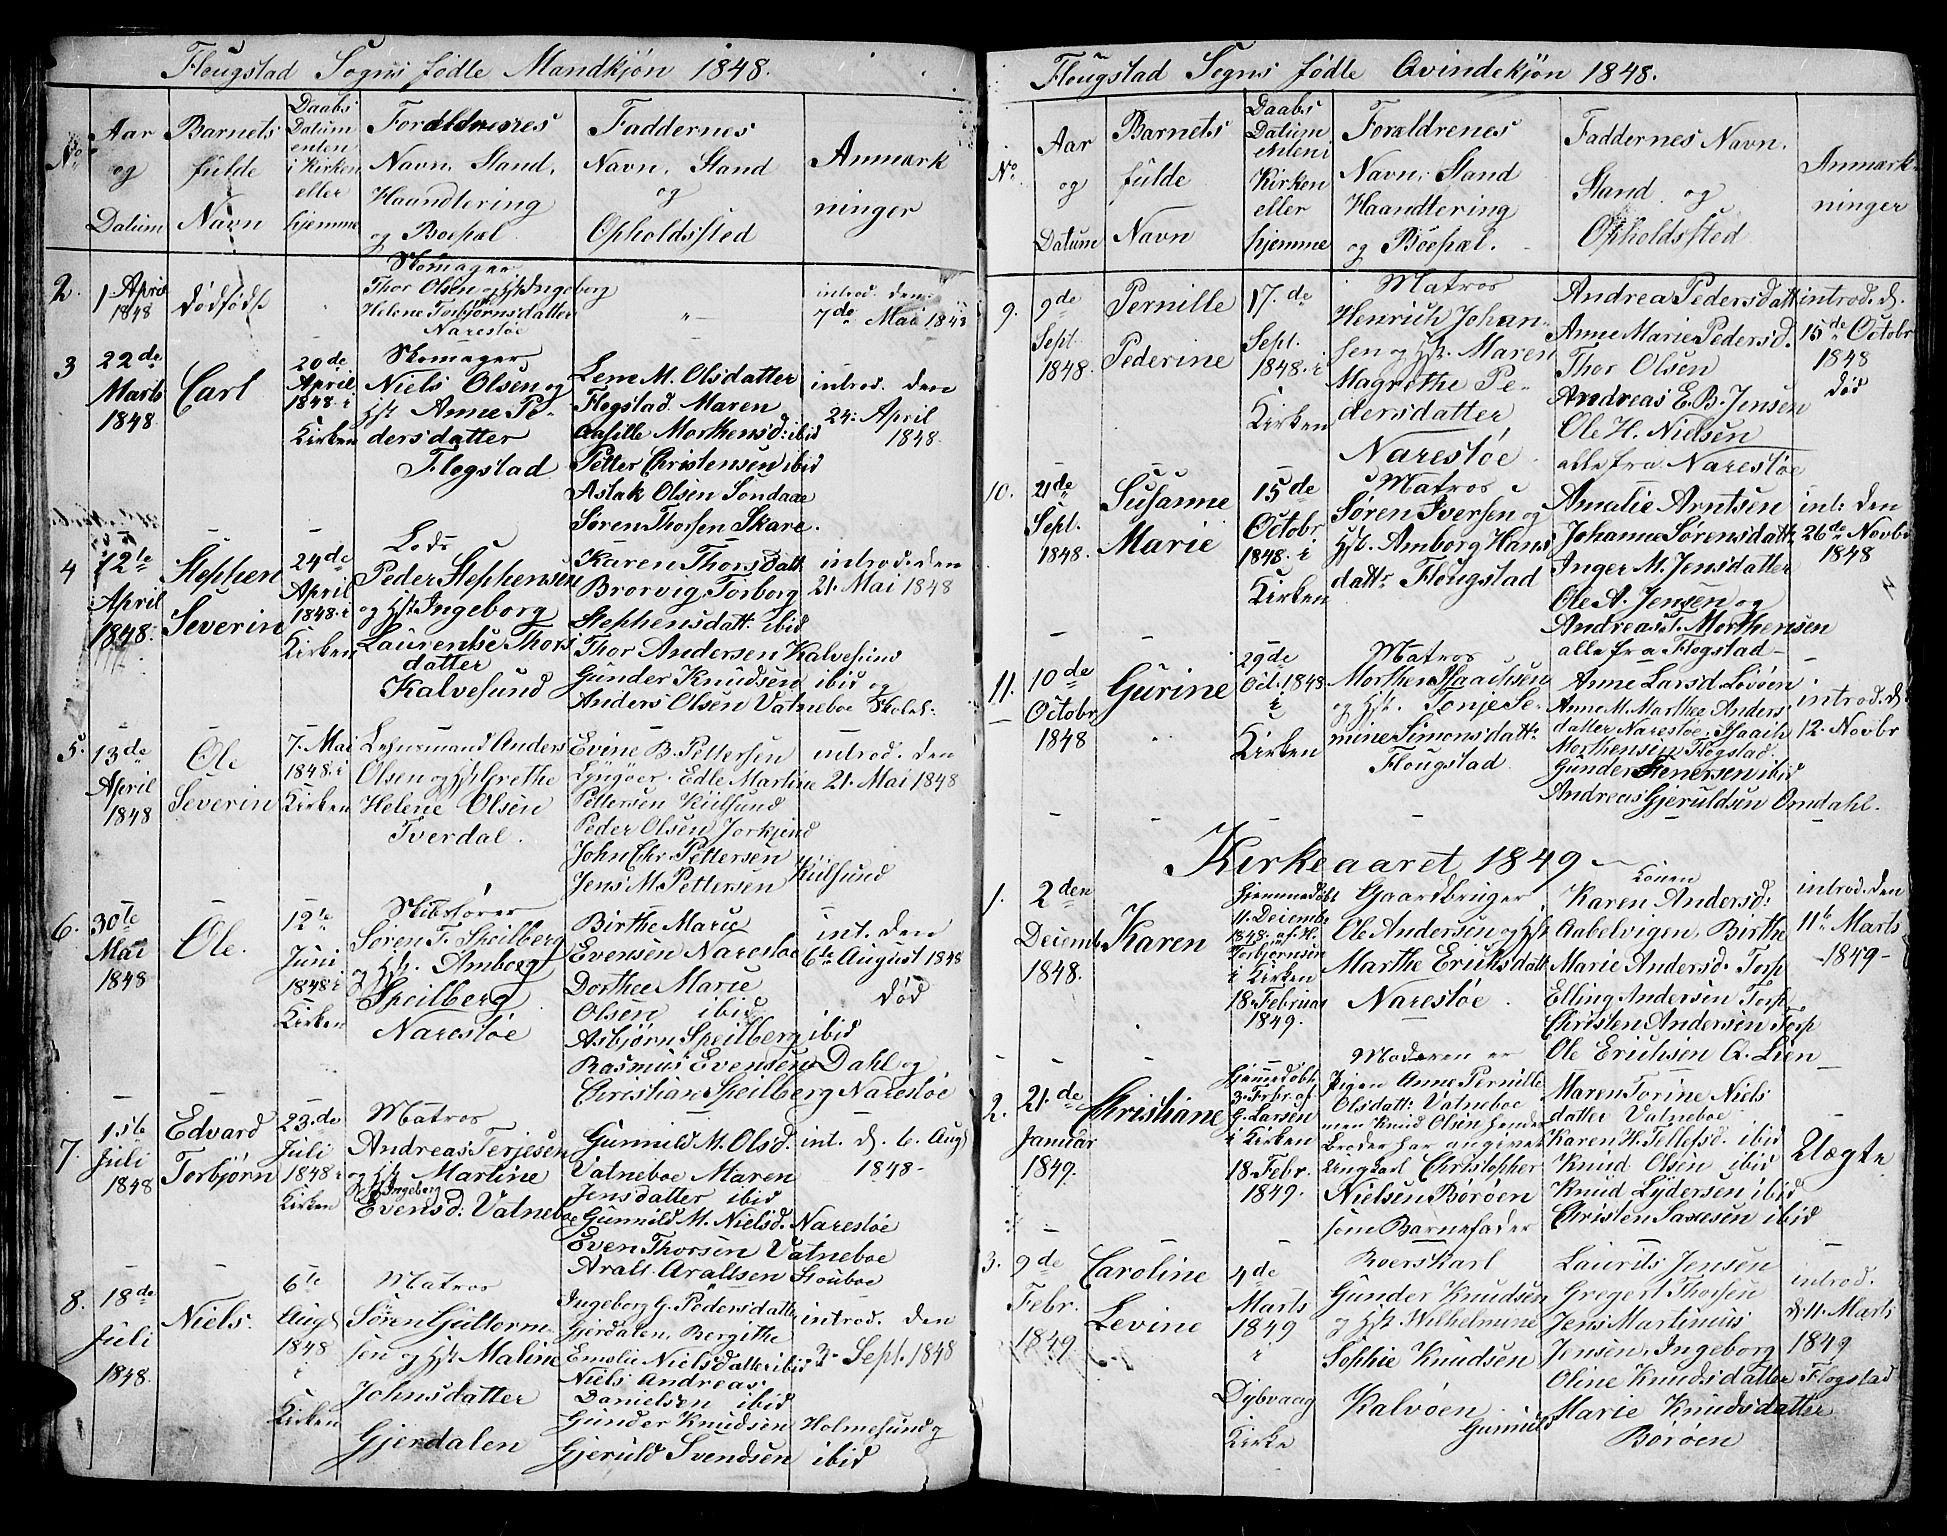 SAK, Dypvåg sokneprestkontor, F/Fb/Fbb/L0001: Klokkerbok nr. B 1, 1816-1850